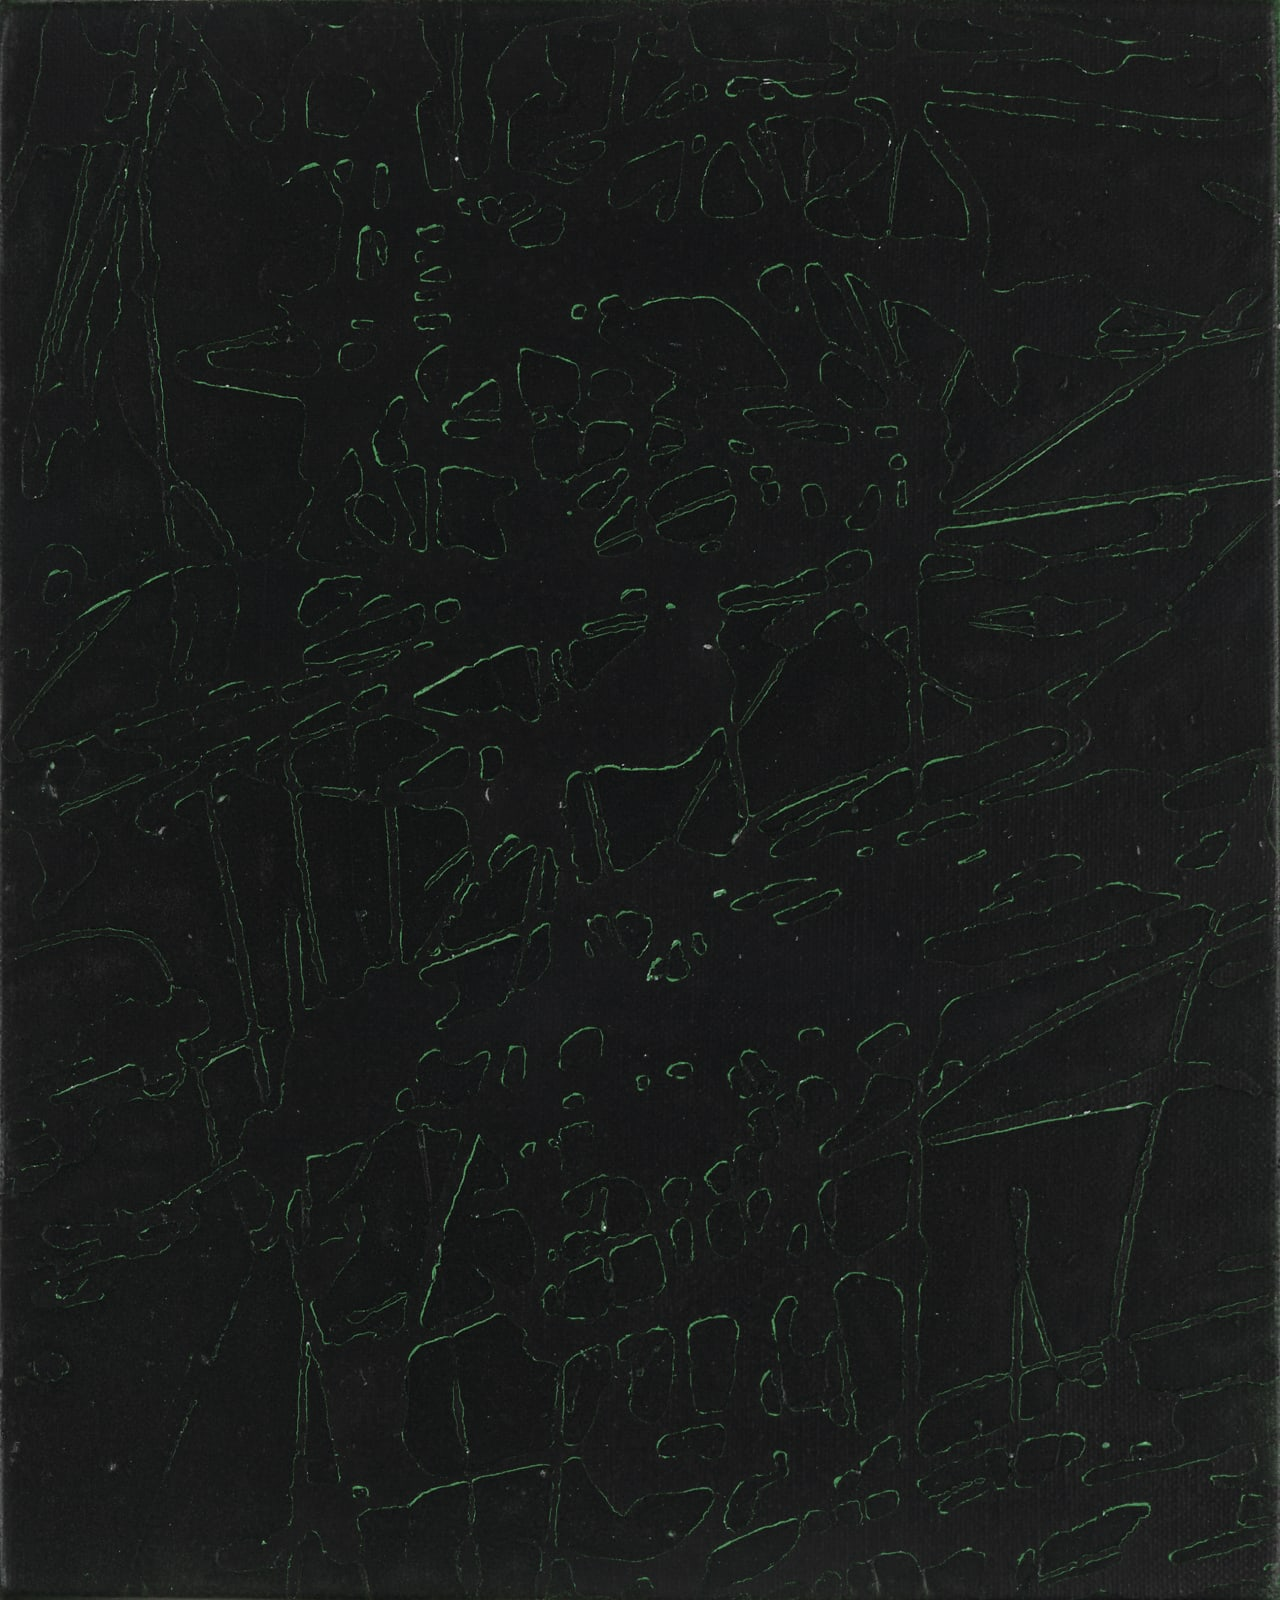 Xiao Bo 蕭搏, Sketches 2017 – Black 2 草圖 2017 – 黑色 2, 2017